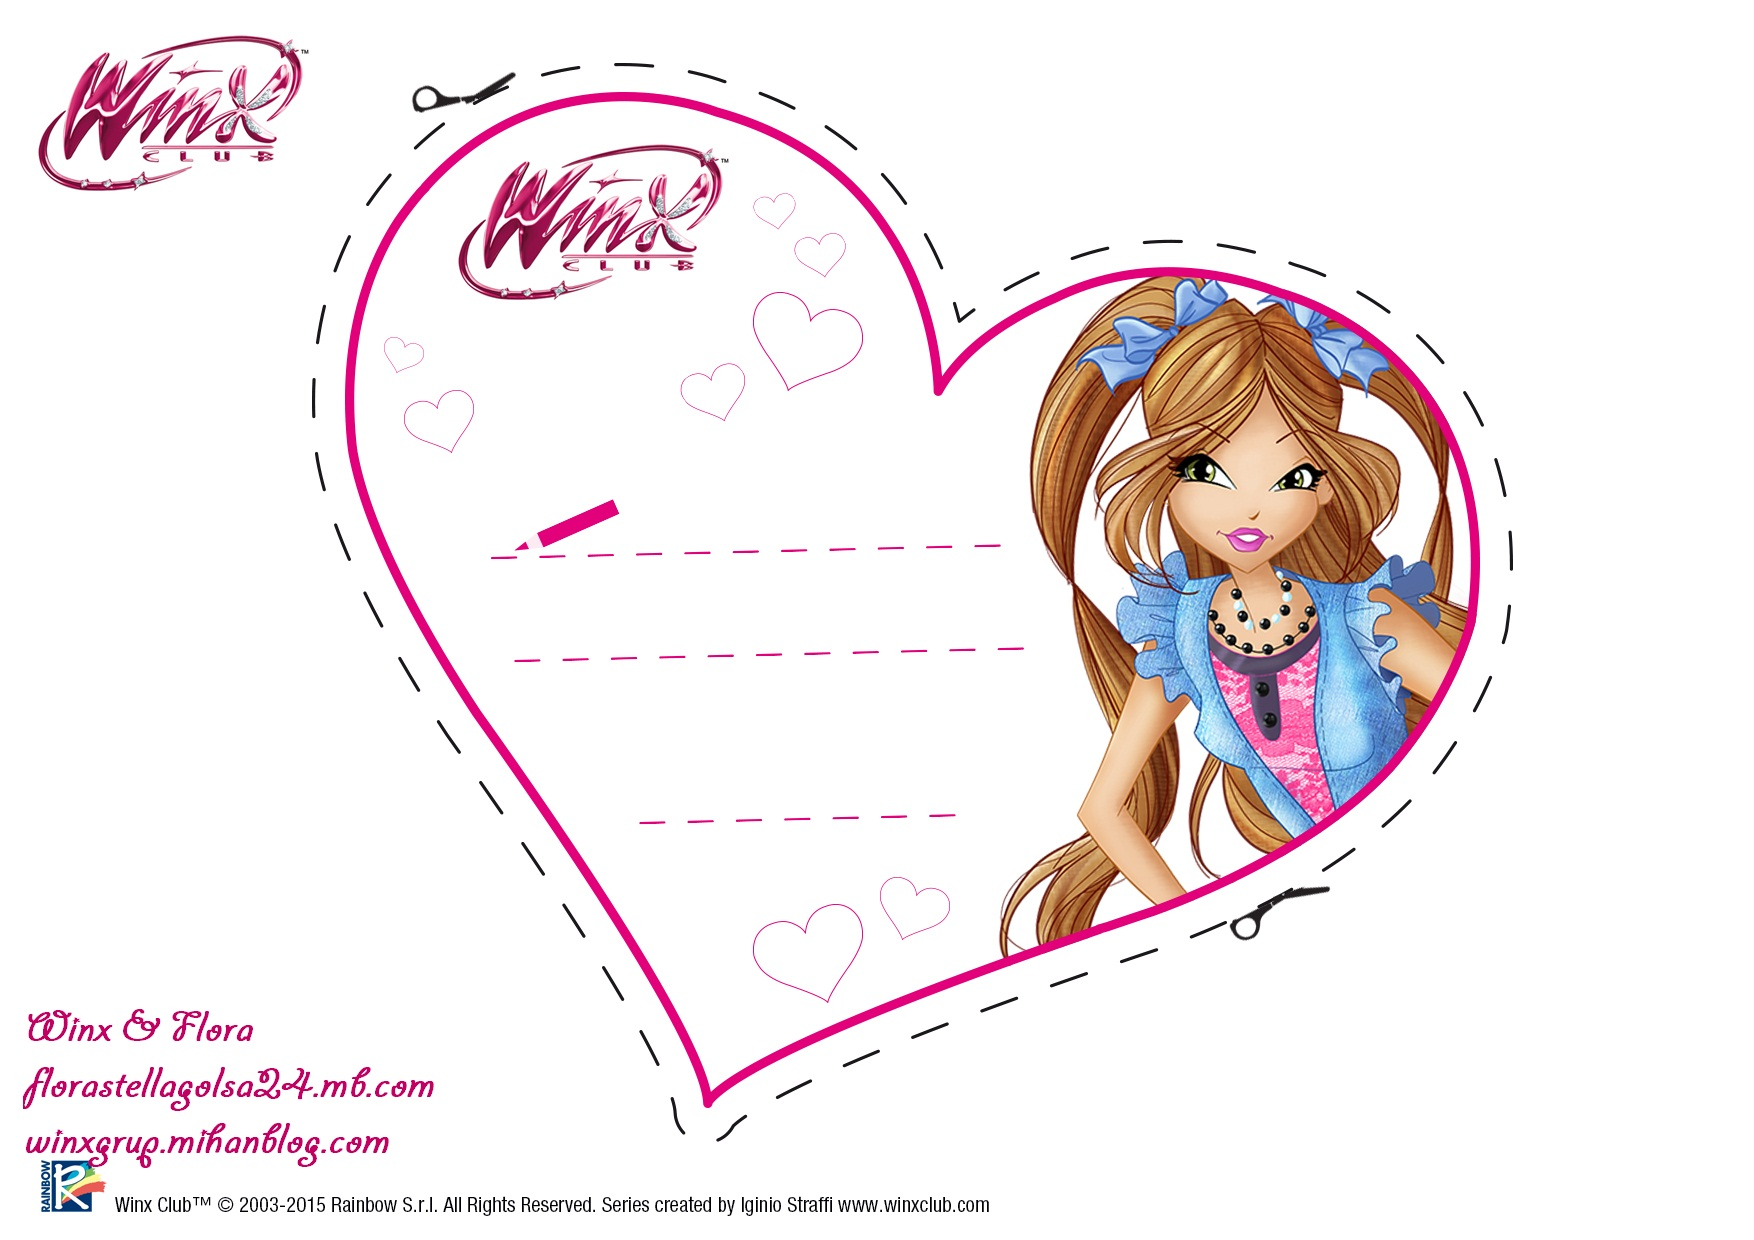 Winx & Flora / وینکس & فلورا / یکی از بهترینو بروز ترین وبای وینکسی